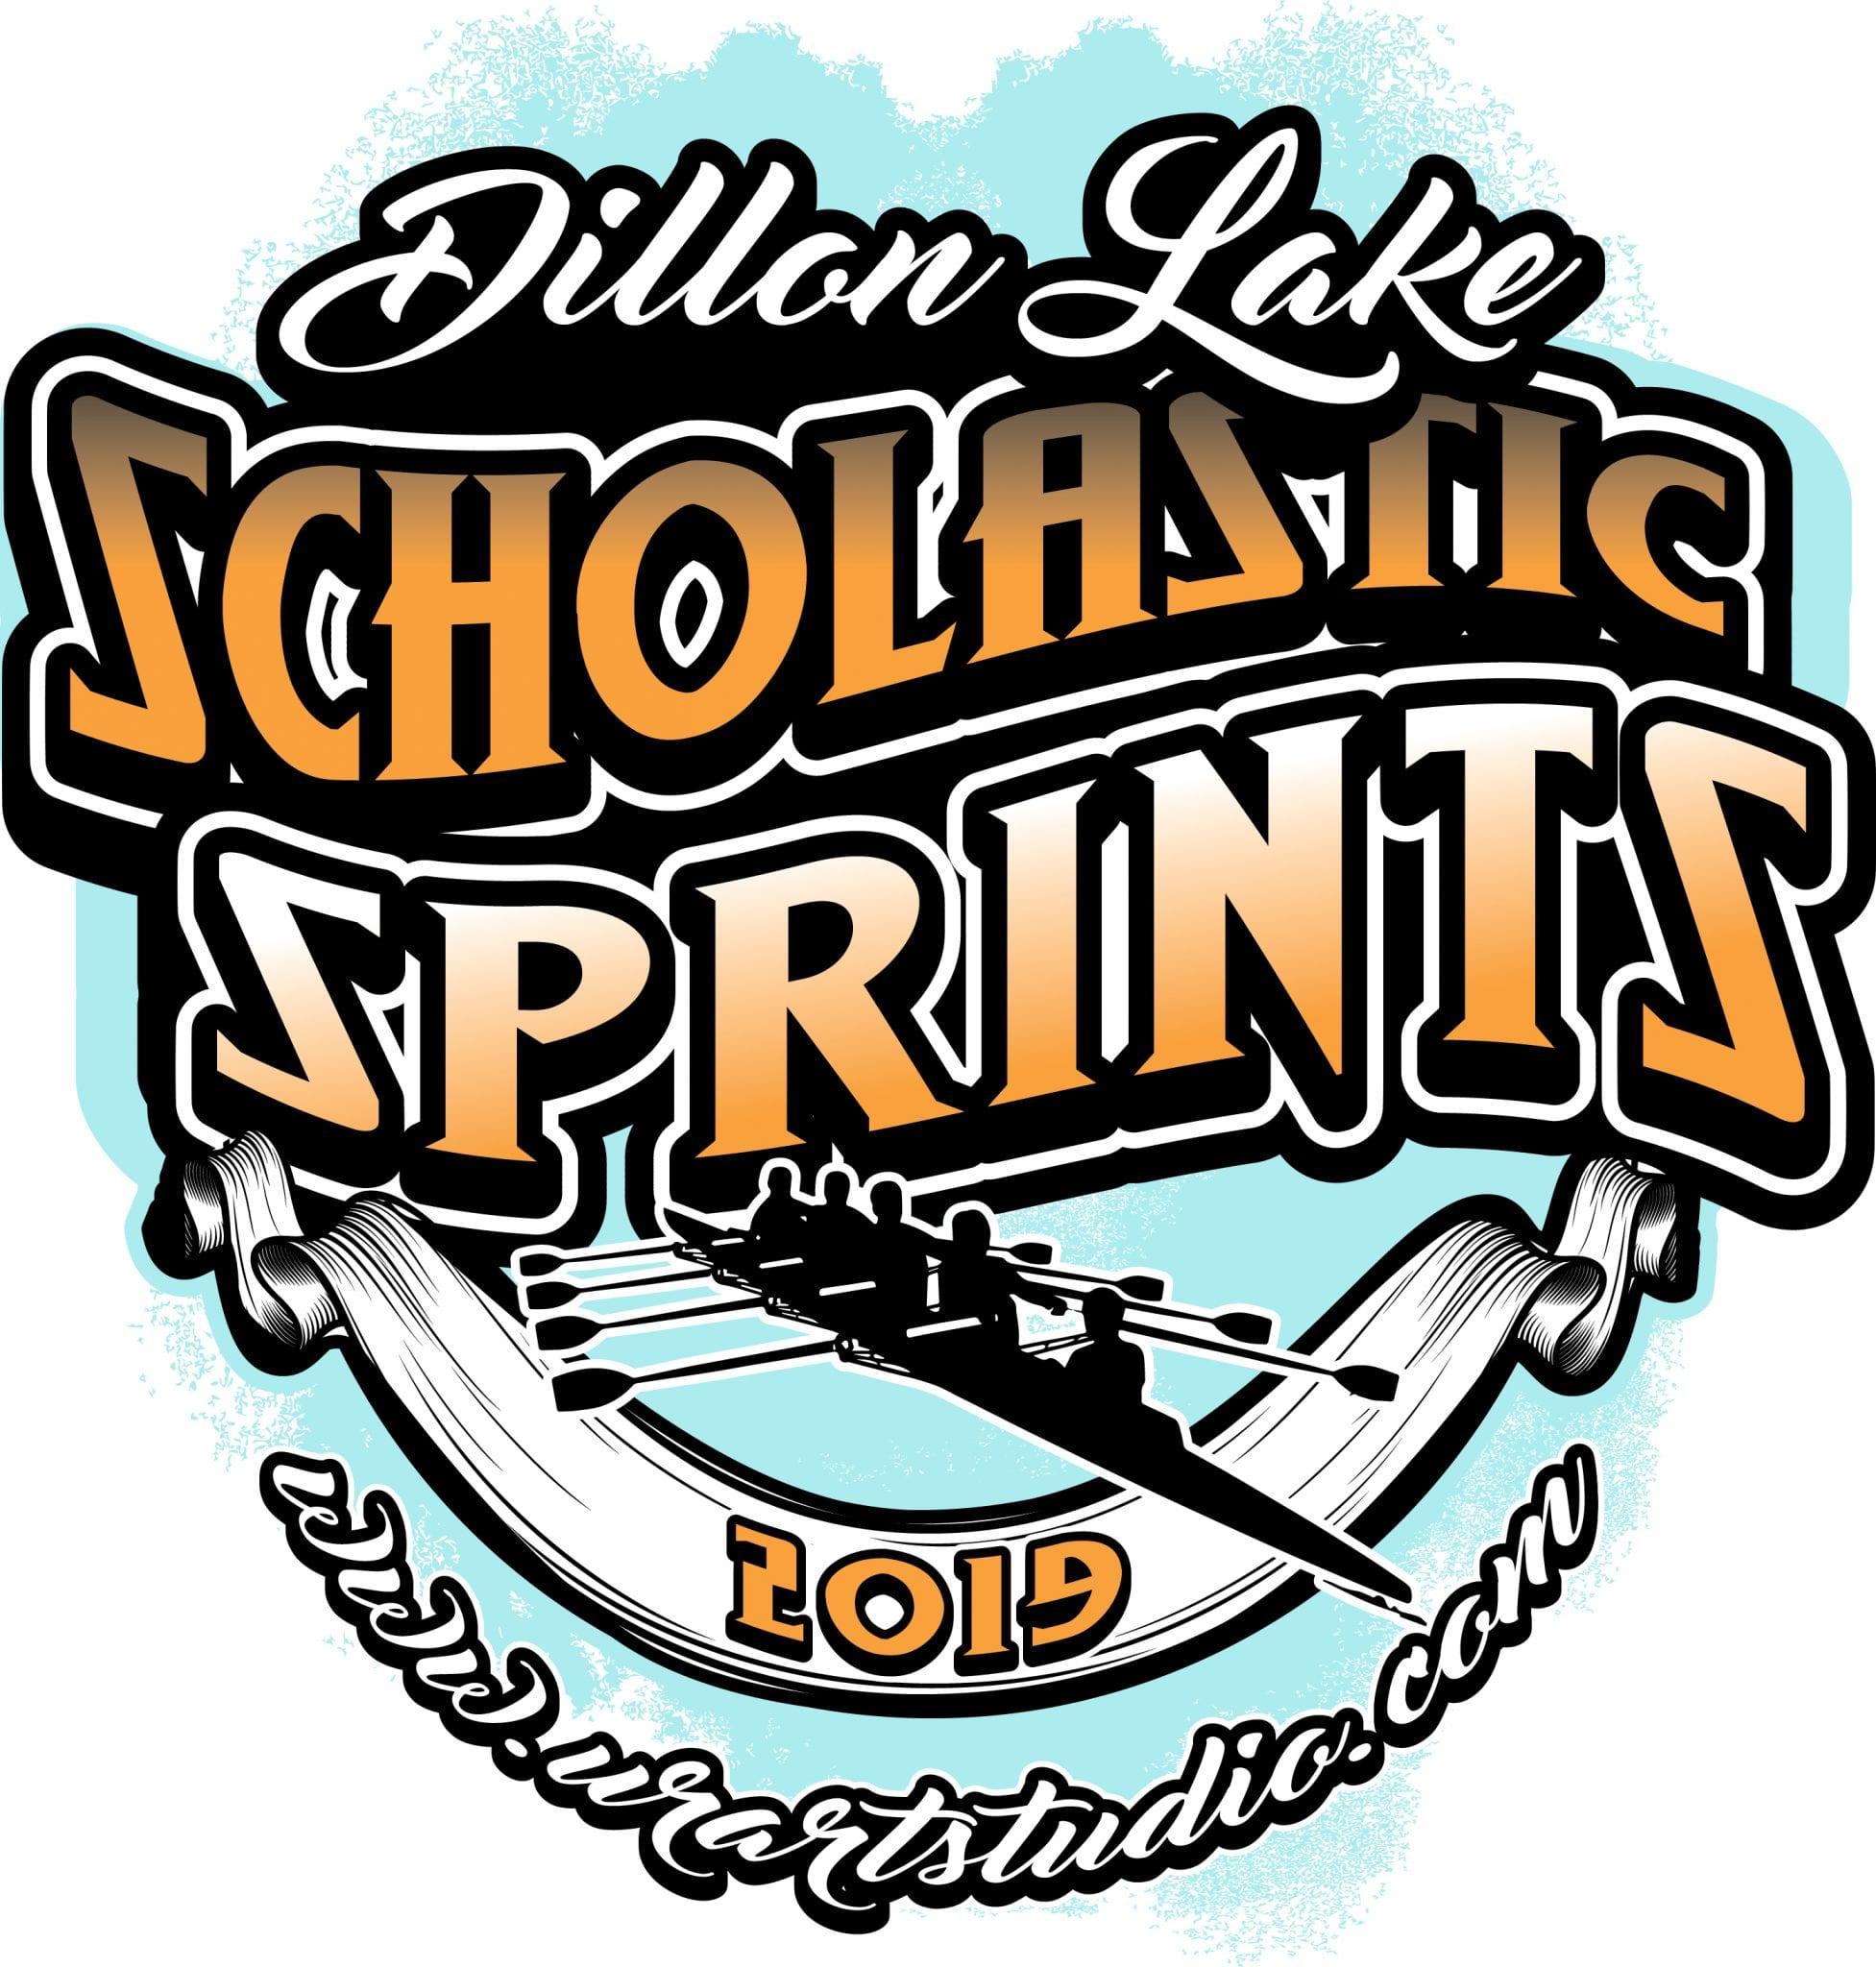 Dillon Lake Scholastic Sprints regatta customizable T-shirt vector logo design for print 2019